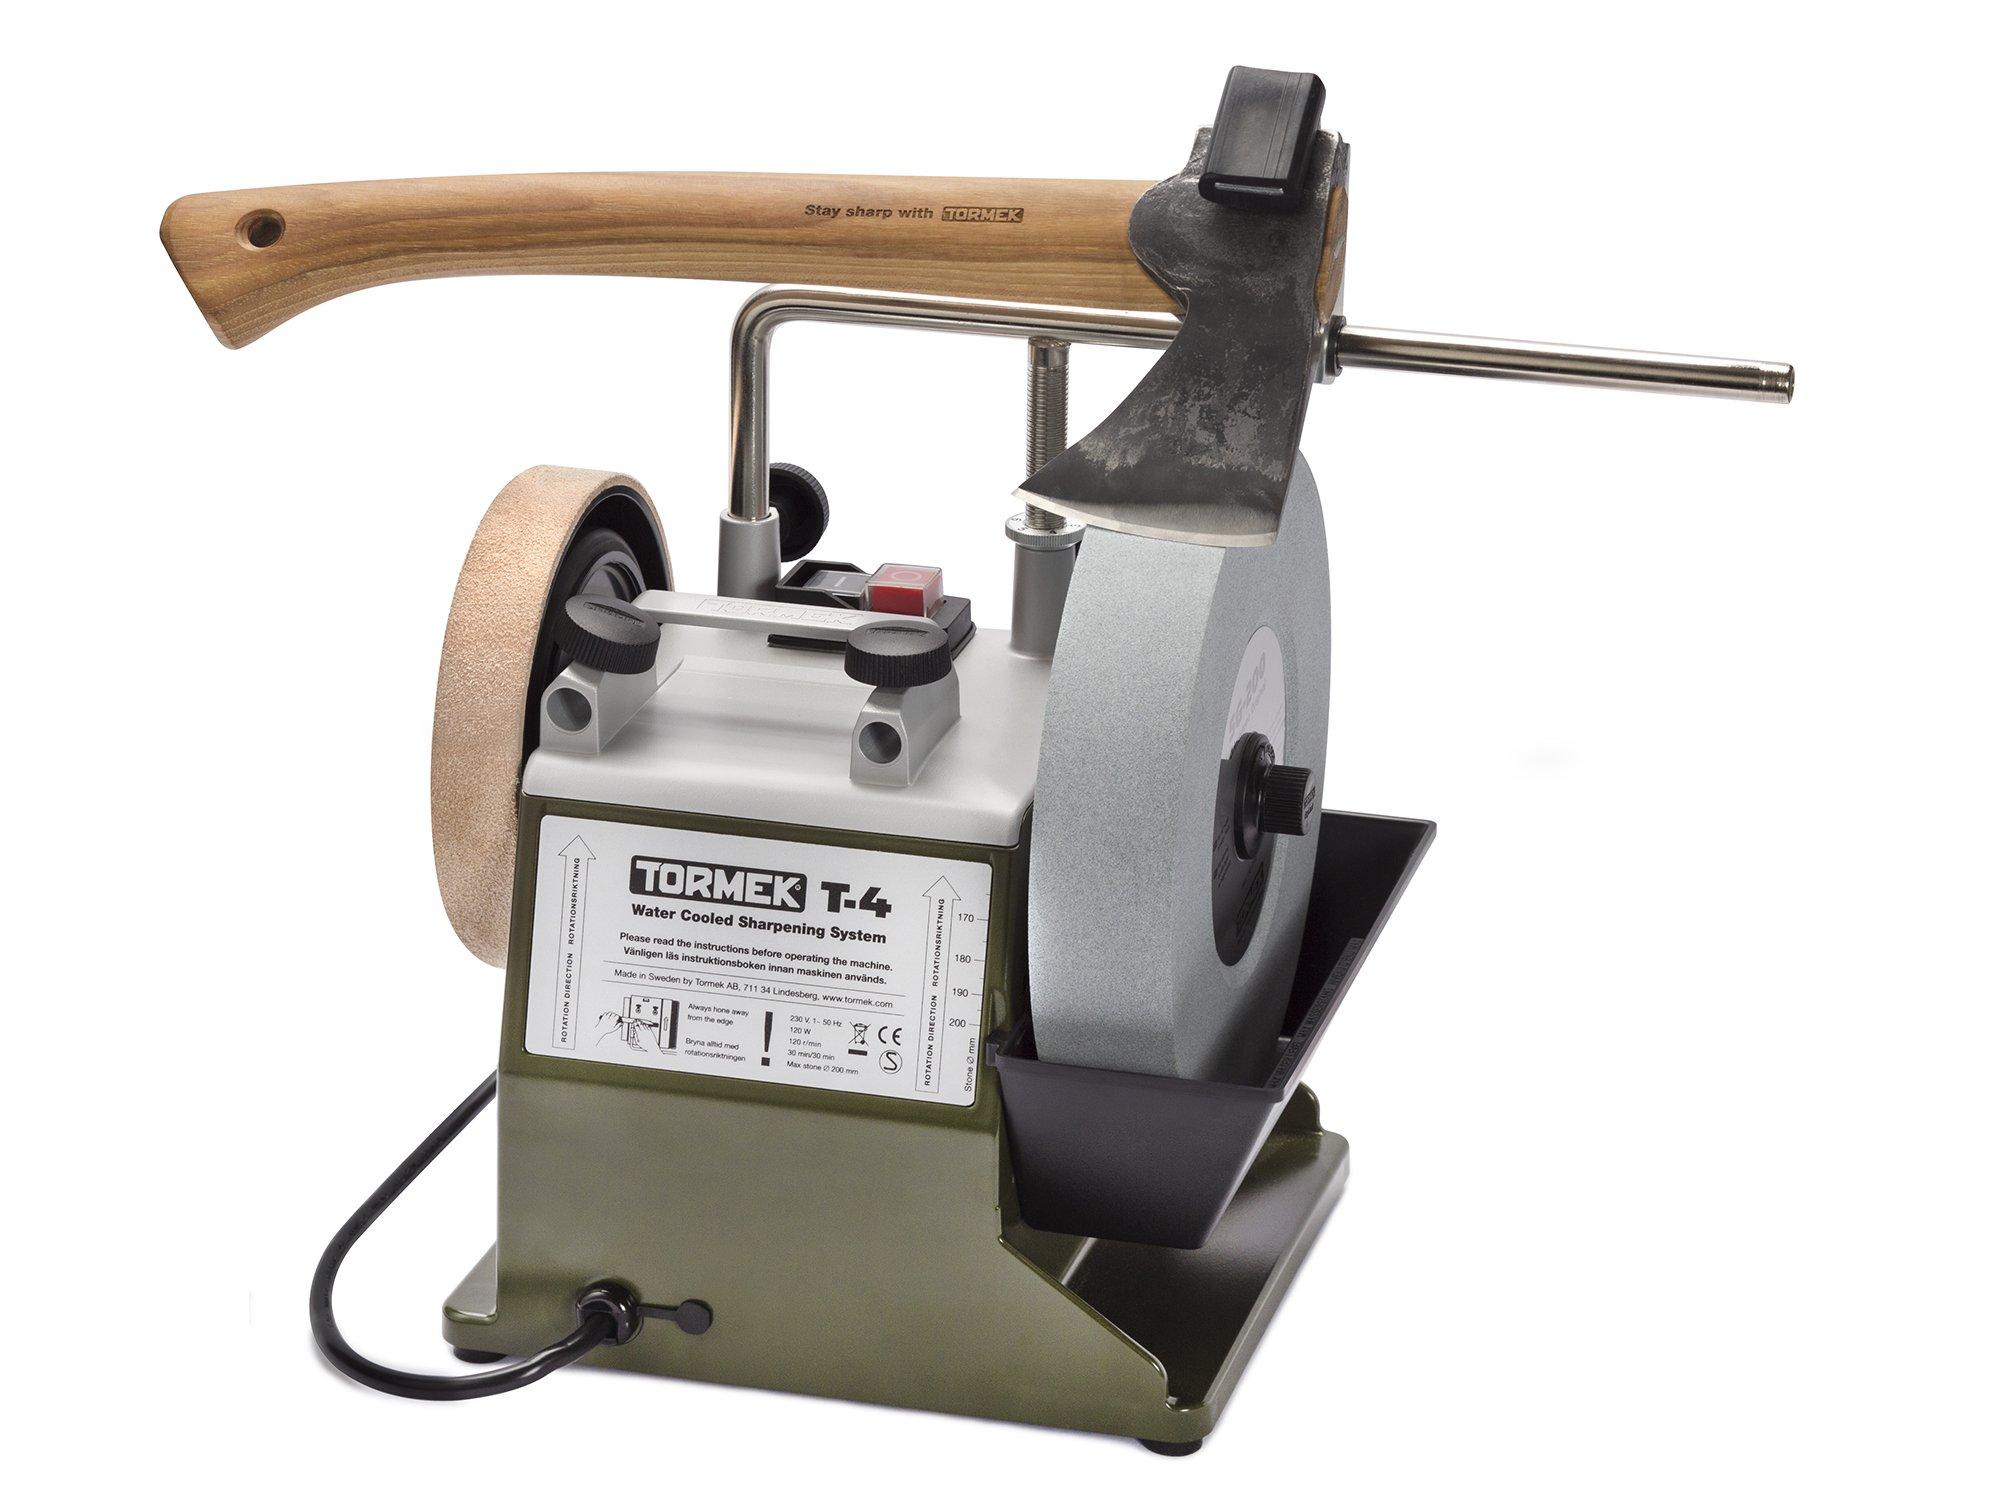 Tormek Limited Edition T4 Bushcraft, Hunter Green, TOR-BCT4 Wet Grinder, Tool and Knife Sharpening System – $110 Bonus Pack Includes SVA-170 Axe Jig and SVM-45 Knife Jig and Mora Kansbol 9865 Knife by Tormek (Image #3)